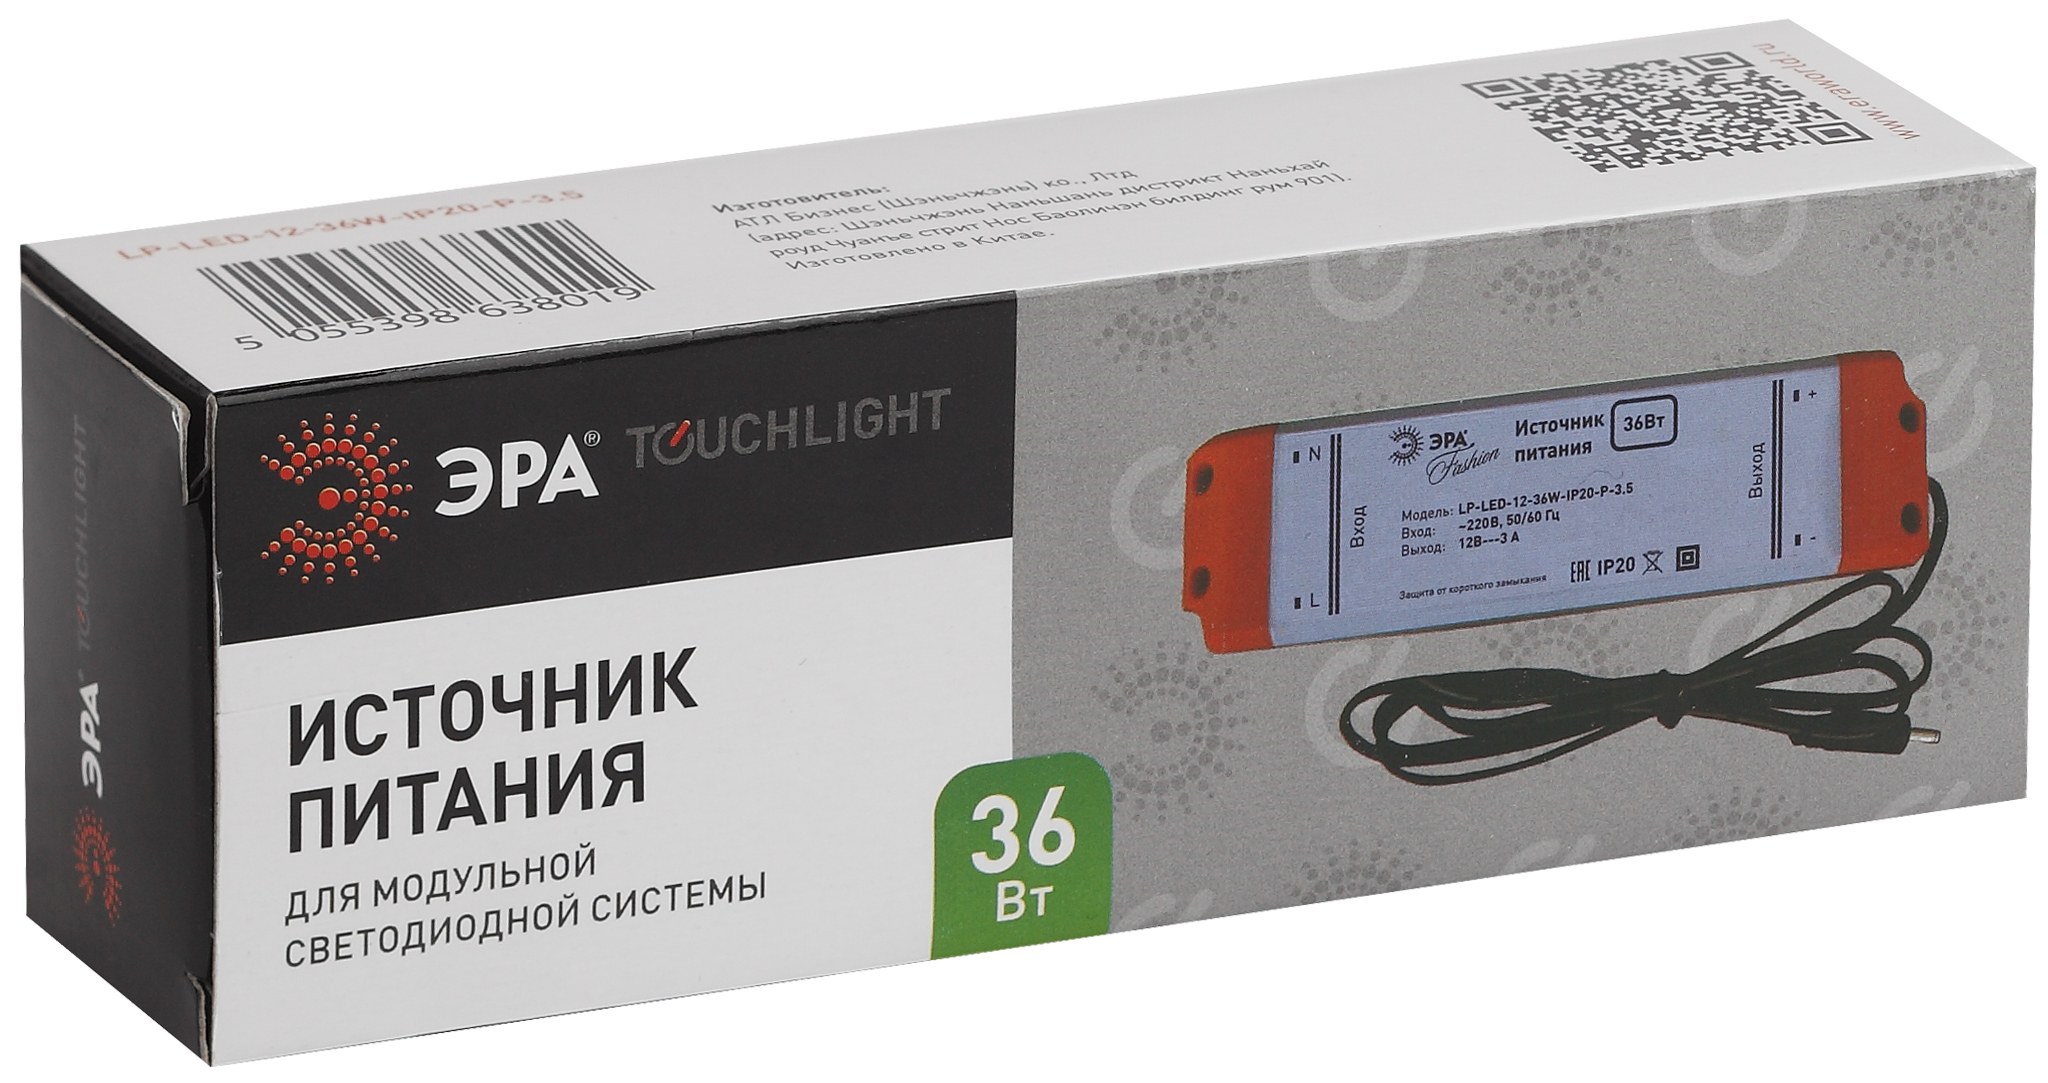 Светильник LED ДБО Tablette 850 16Вт 5000К IP65